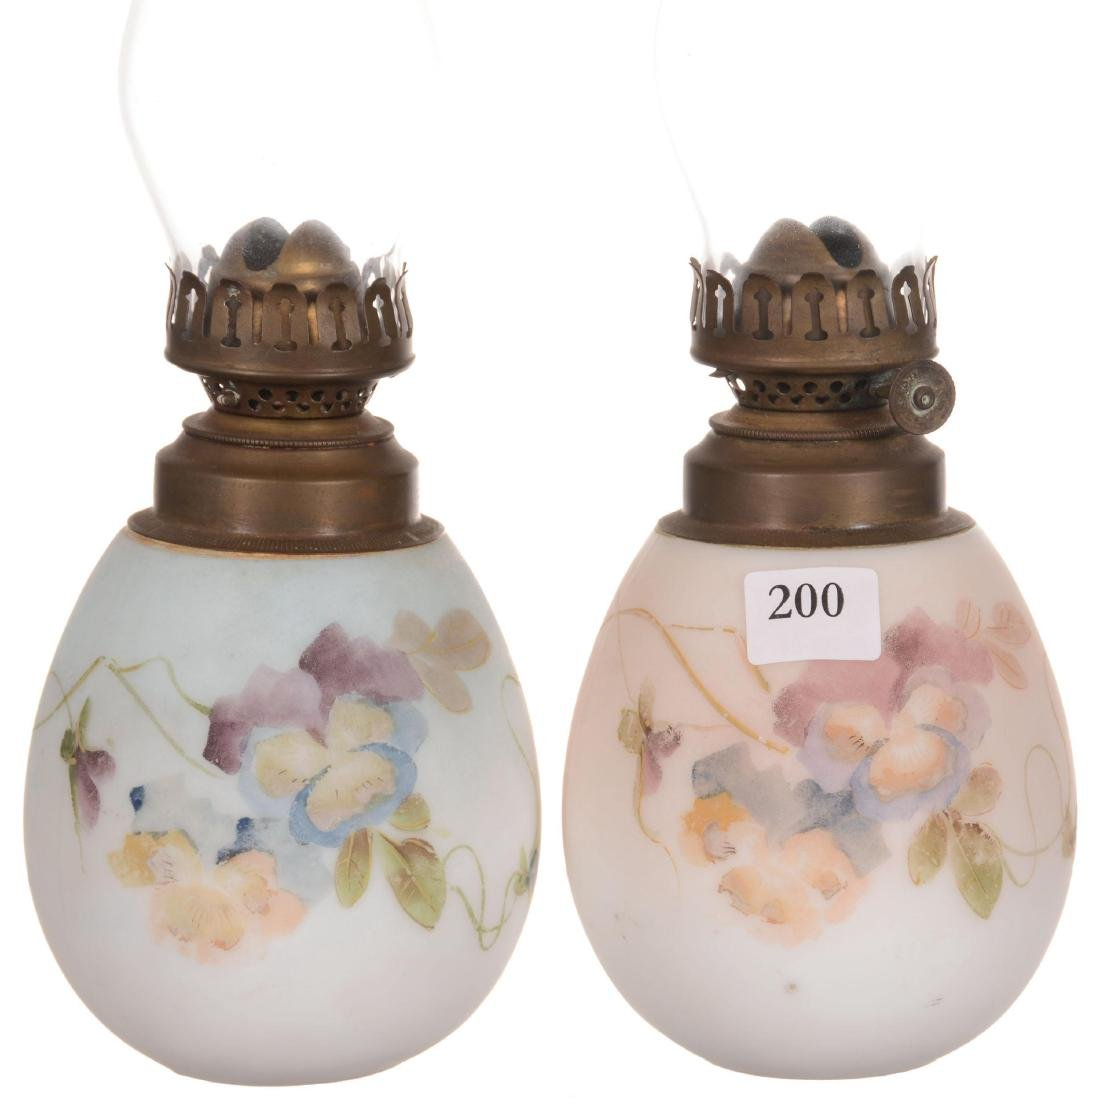 Two Unmarked Mt. Washington Kerosene Boudoir Lamps